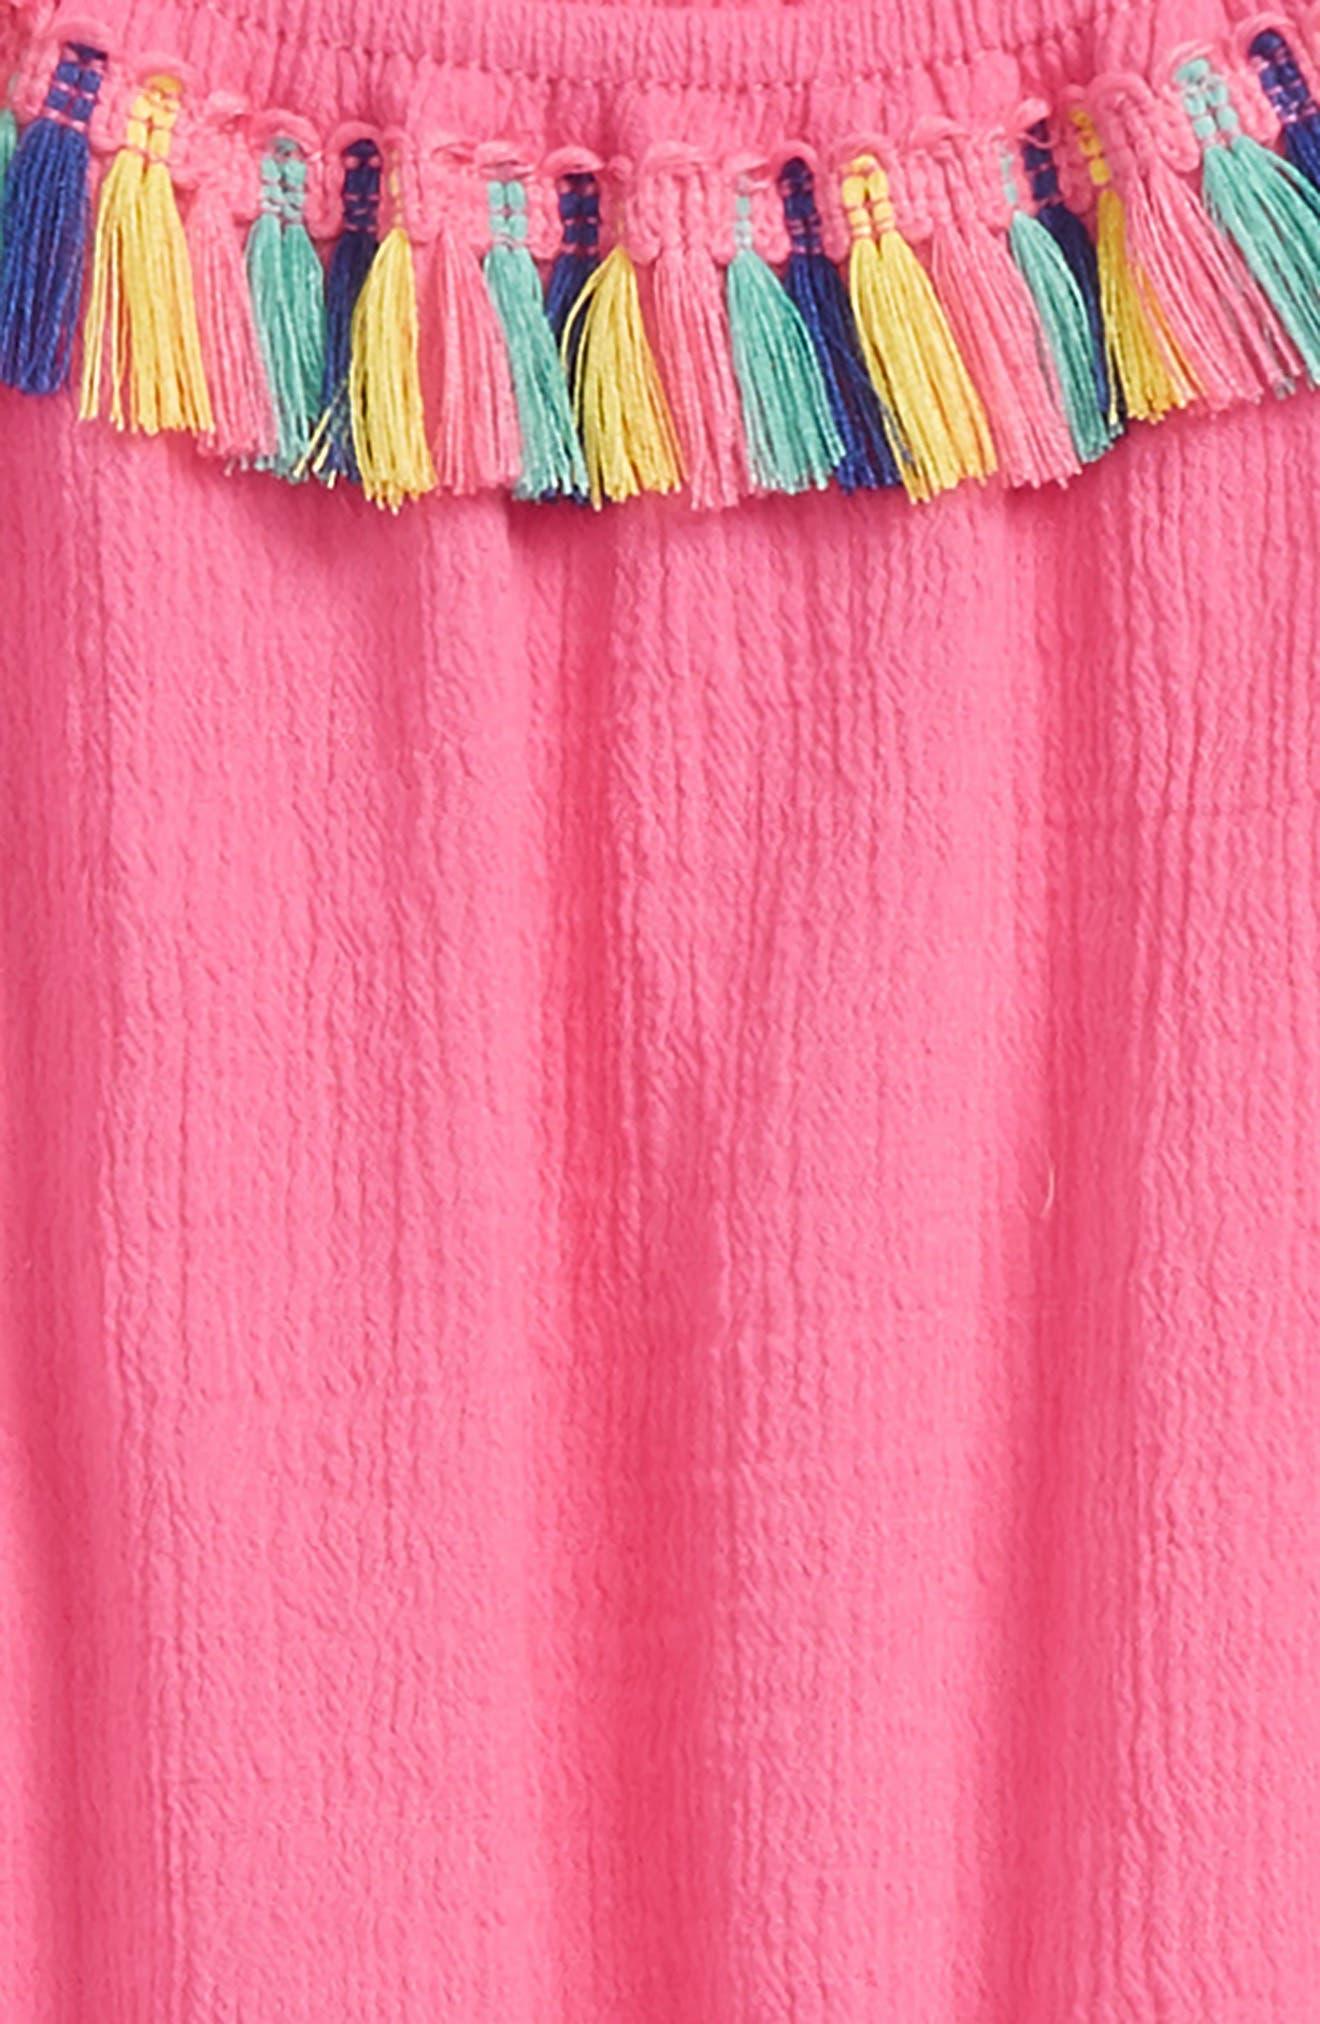 Rainbow Tassel Trim Cover-Up Dress,                             Alternate thumbnail 2, color,                             650